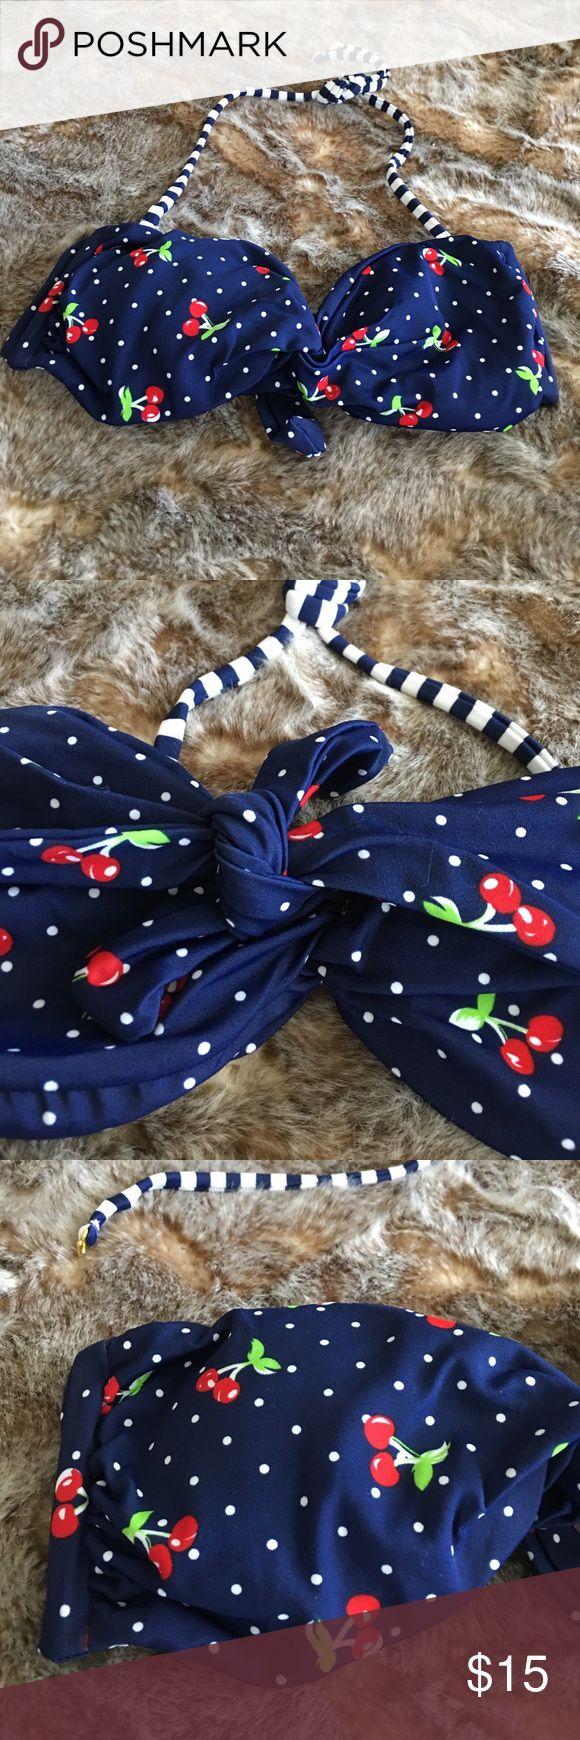 Cherry 🍒 Polka Dot Bandeau Bikini Top New ! In Plastic. Cherry 🍒Pin-up Polka Dot Bikini Top. Detachable Navy striped halter top. Size Large. back has tie closure. Super cute! Delia's Brand. Swim Bikinis